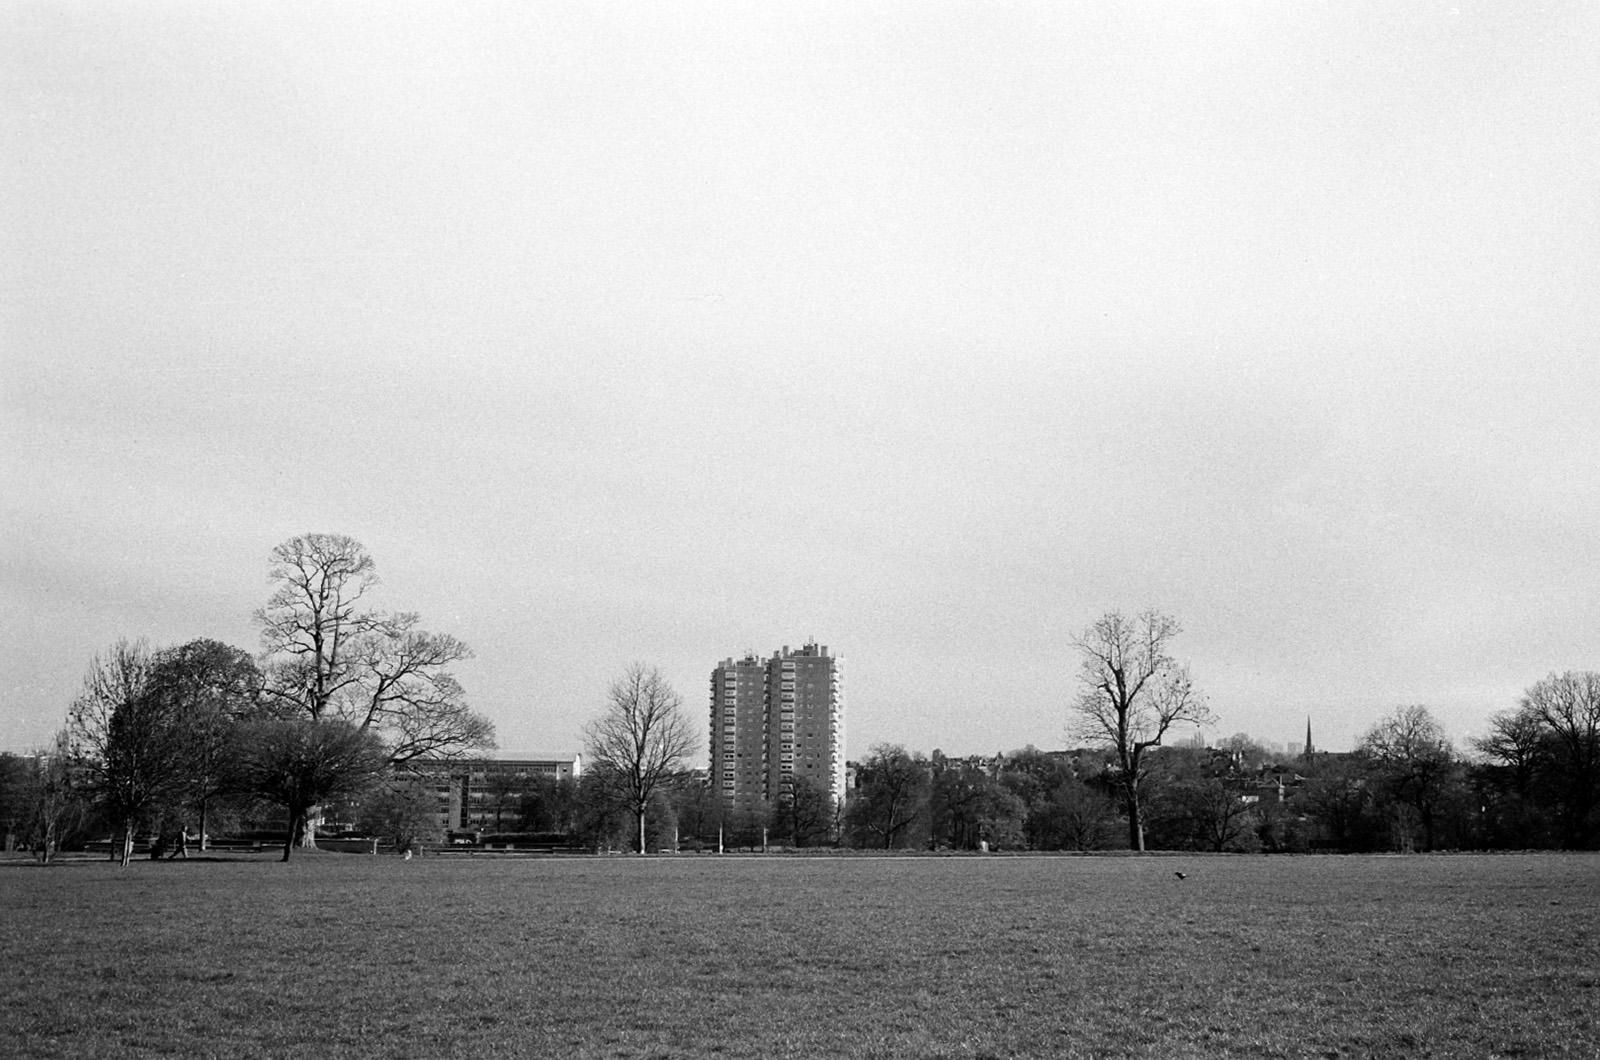 Fomapan 100 image of Brockwell park.